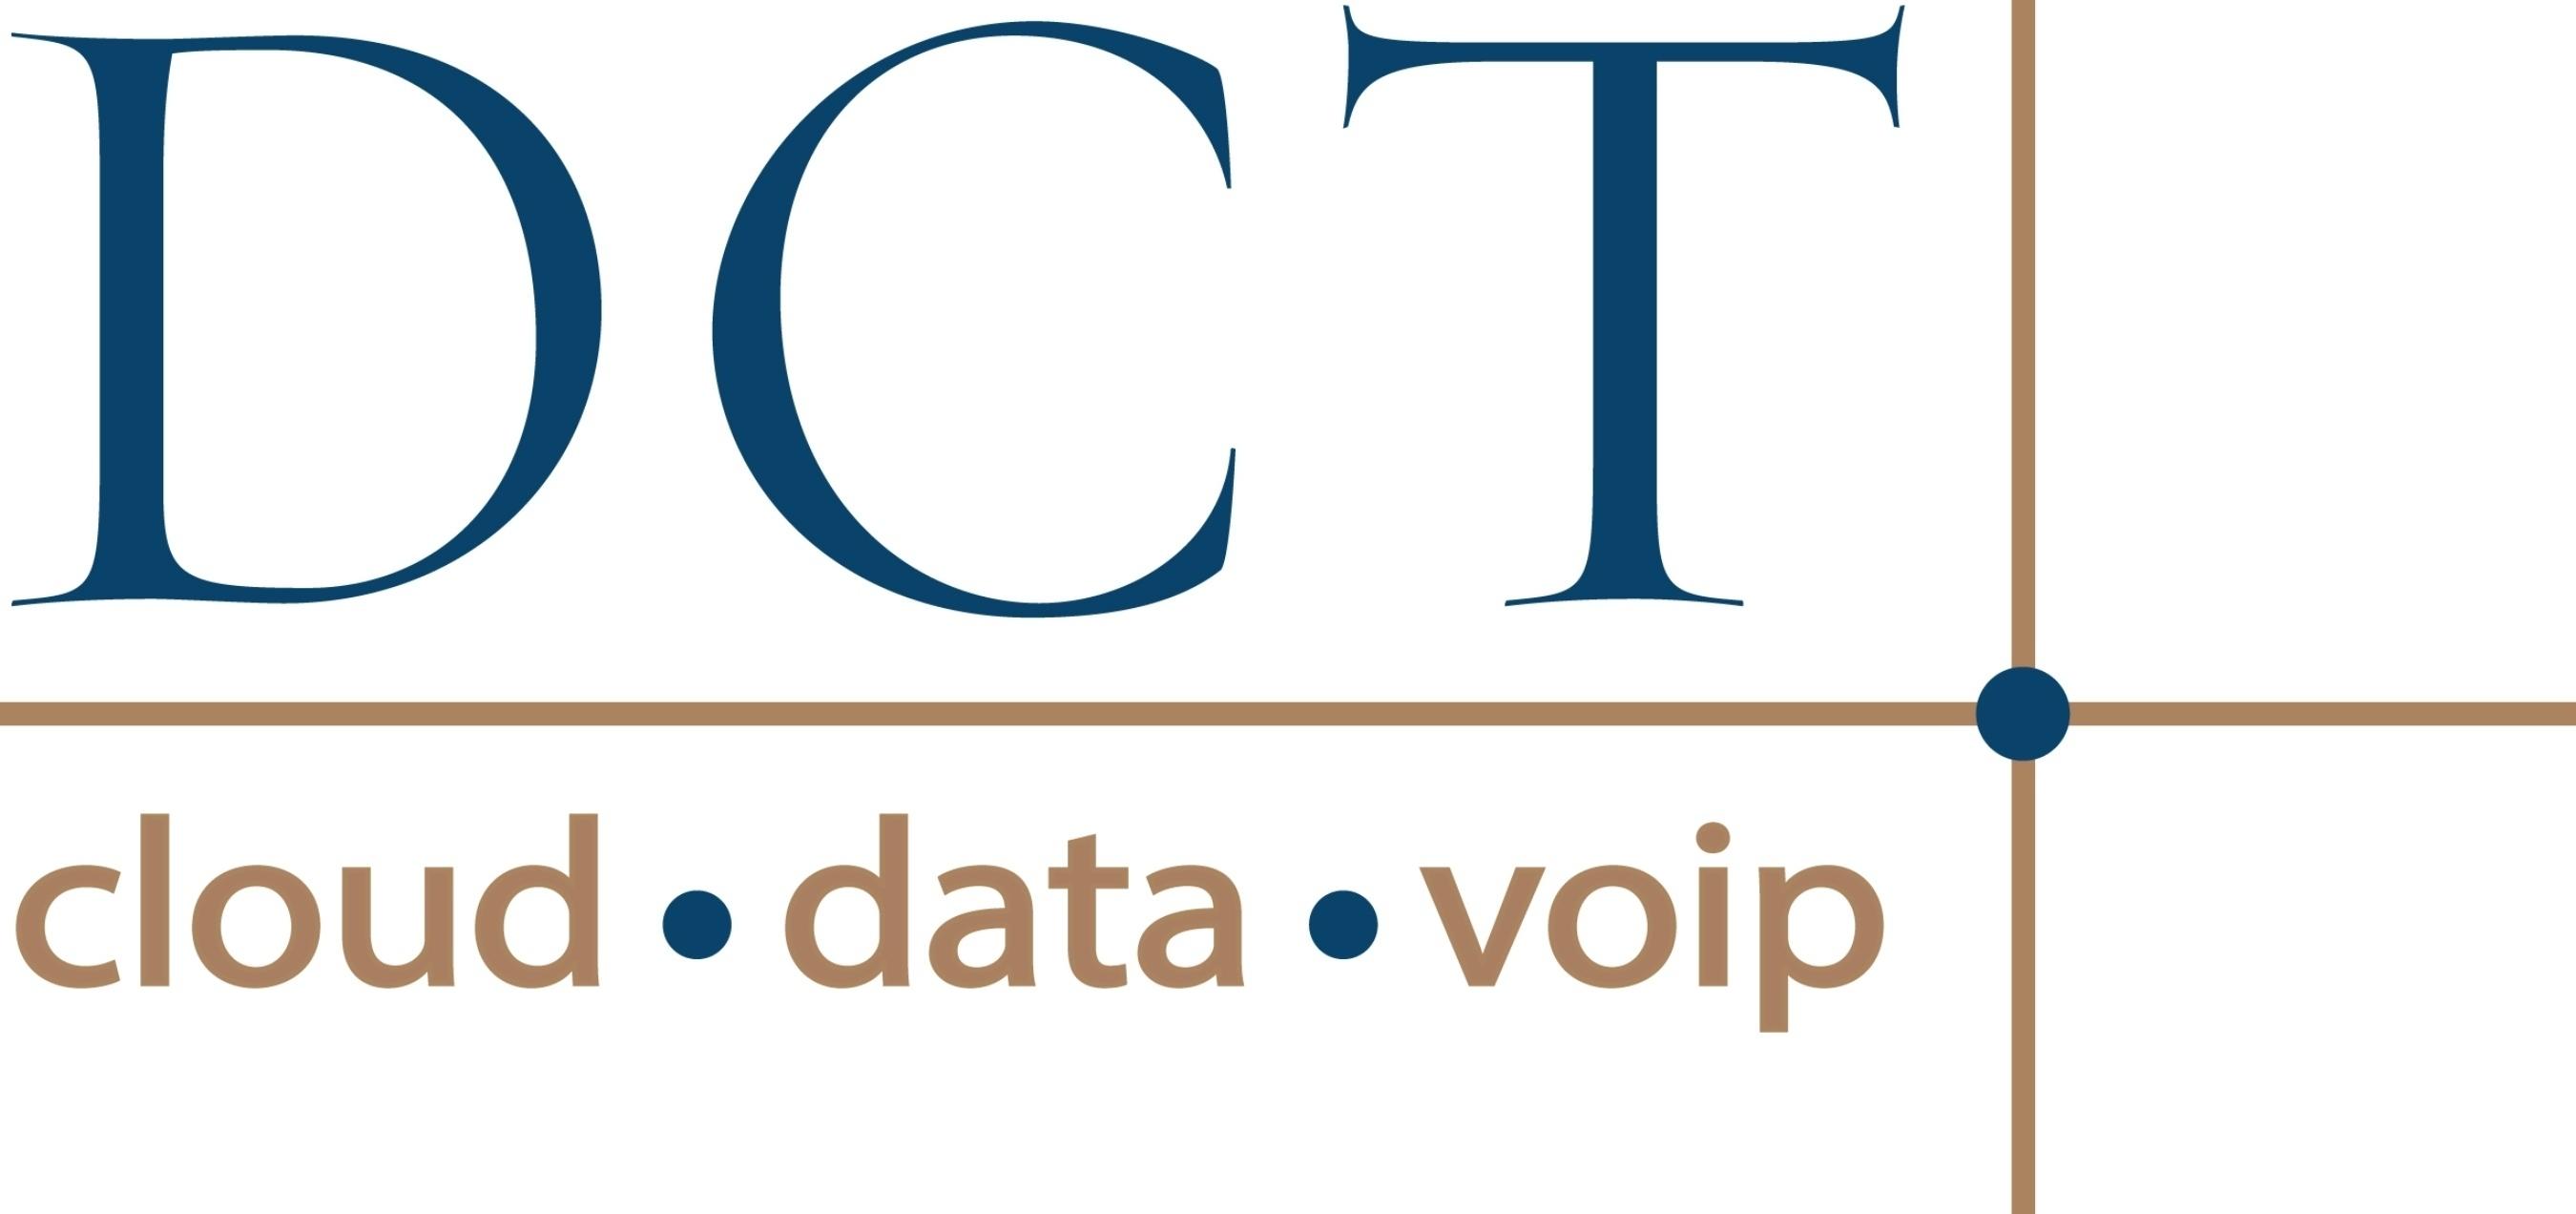 DCT Telecom Group Expands Customer Support Team